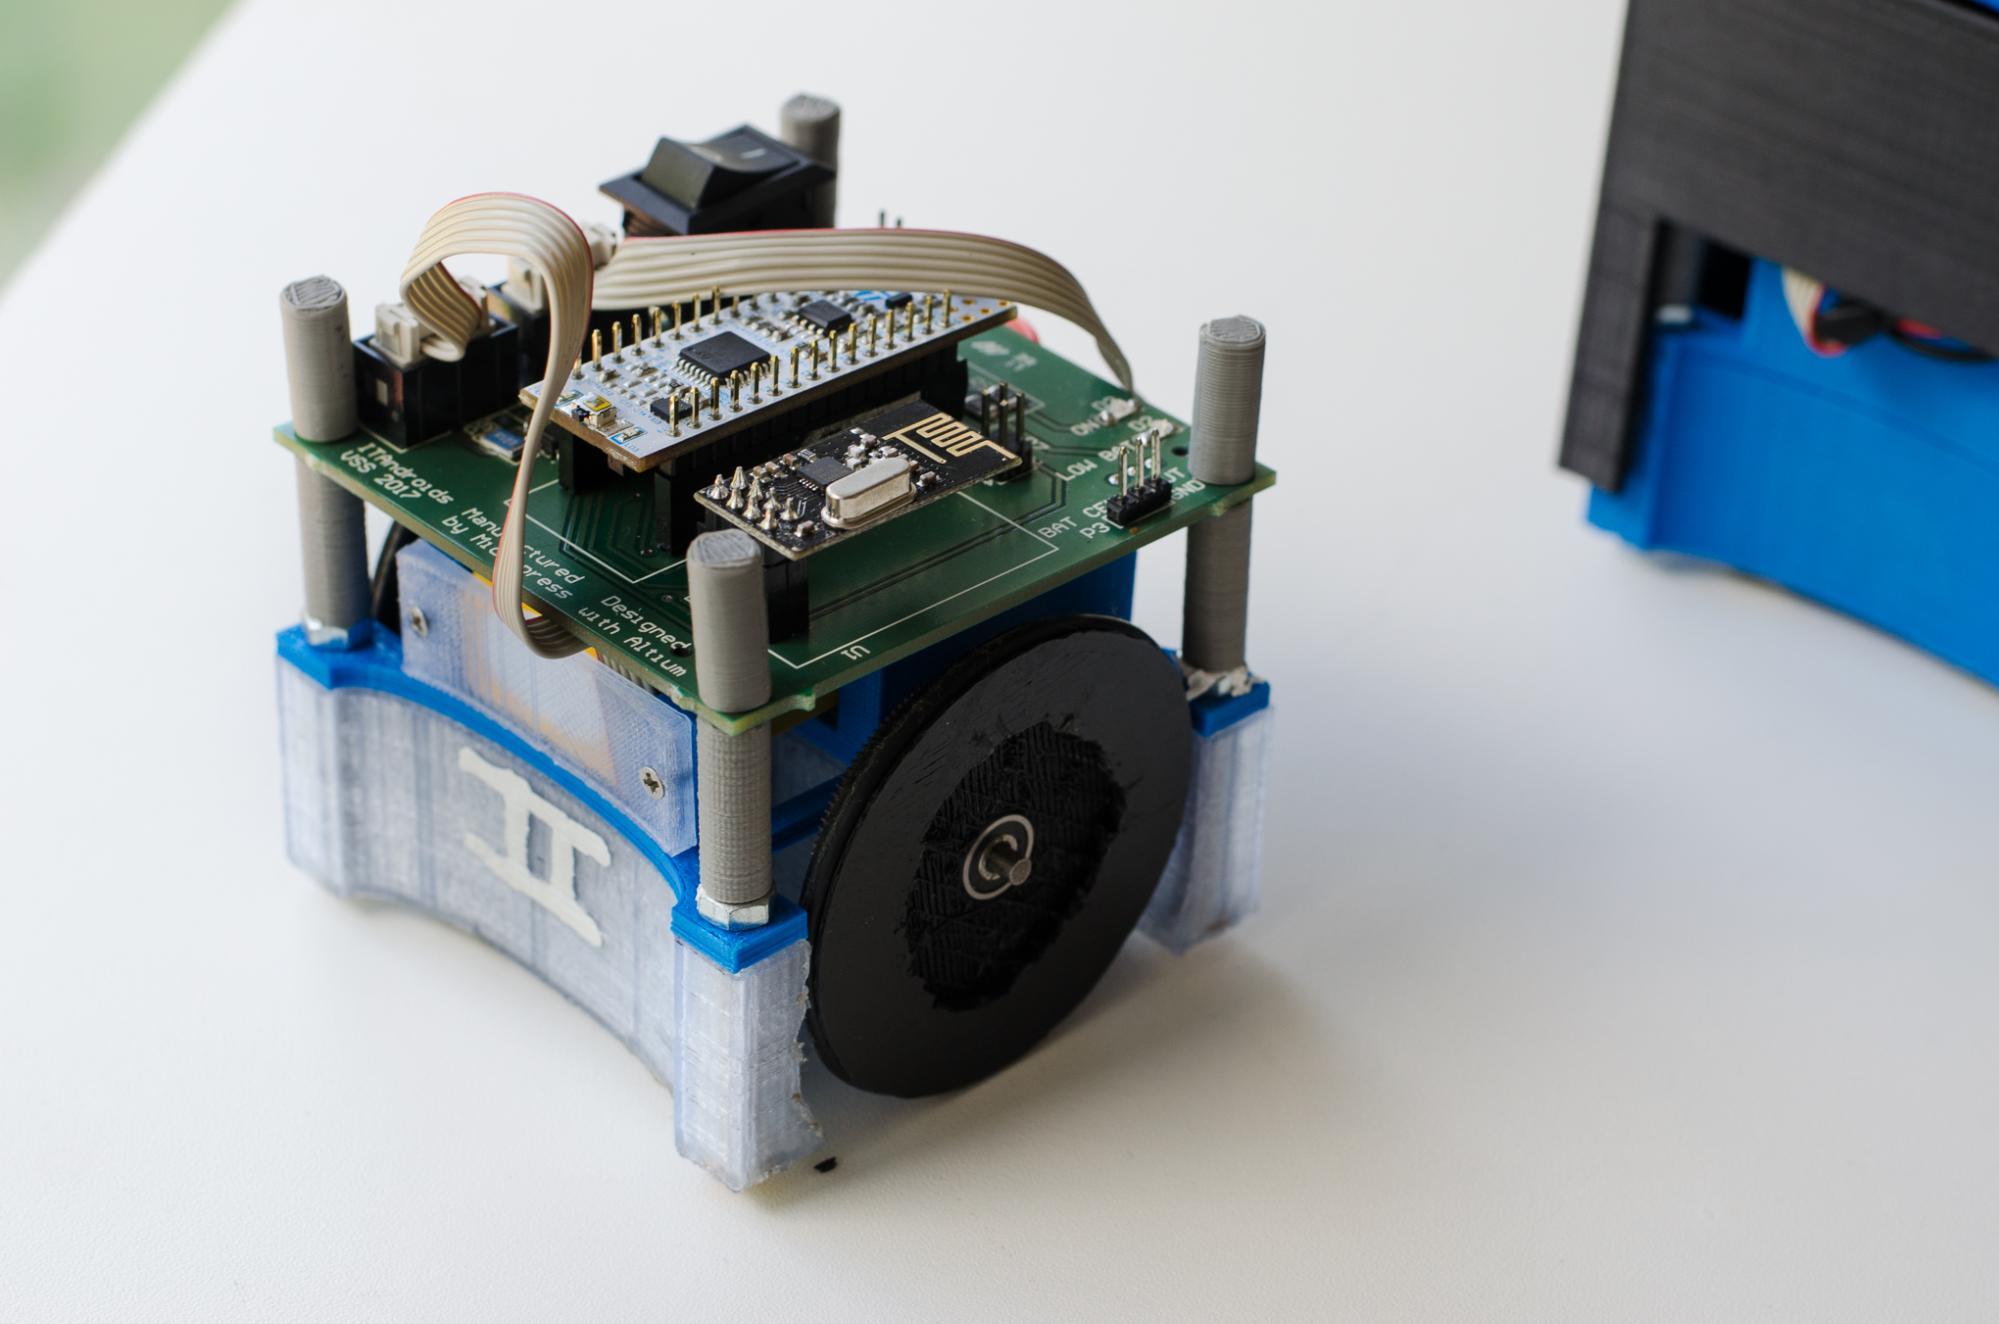 Altium Designerソフトウェアを使ってチームが設計した回路基板